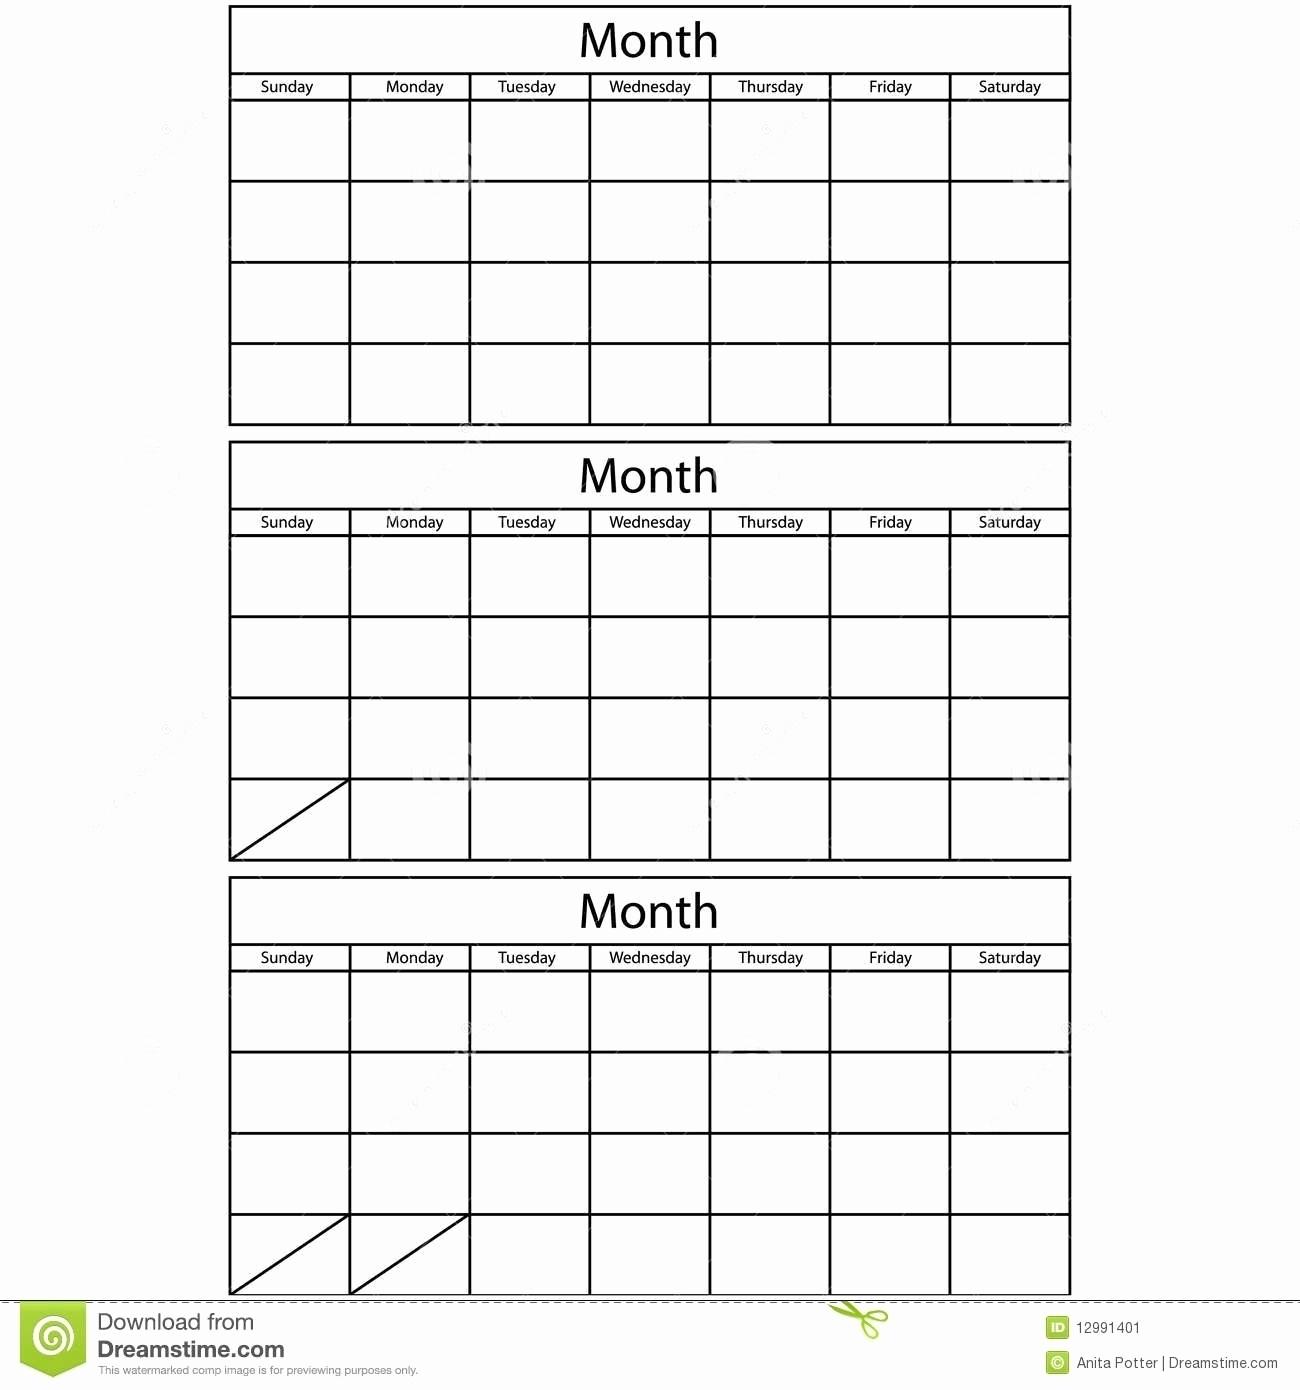 Free 3 Month Calendar Templates - Calendar Inspiration Design with regard to 3 Month Calendar Printable Template